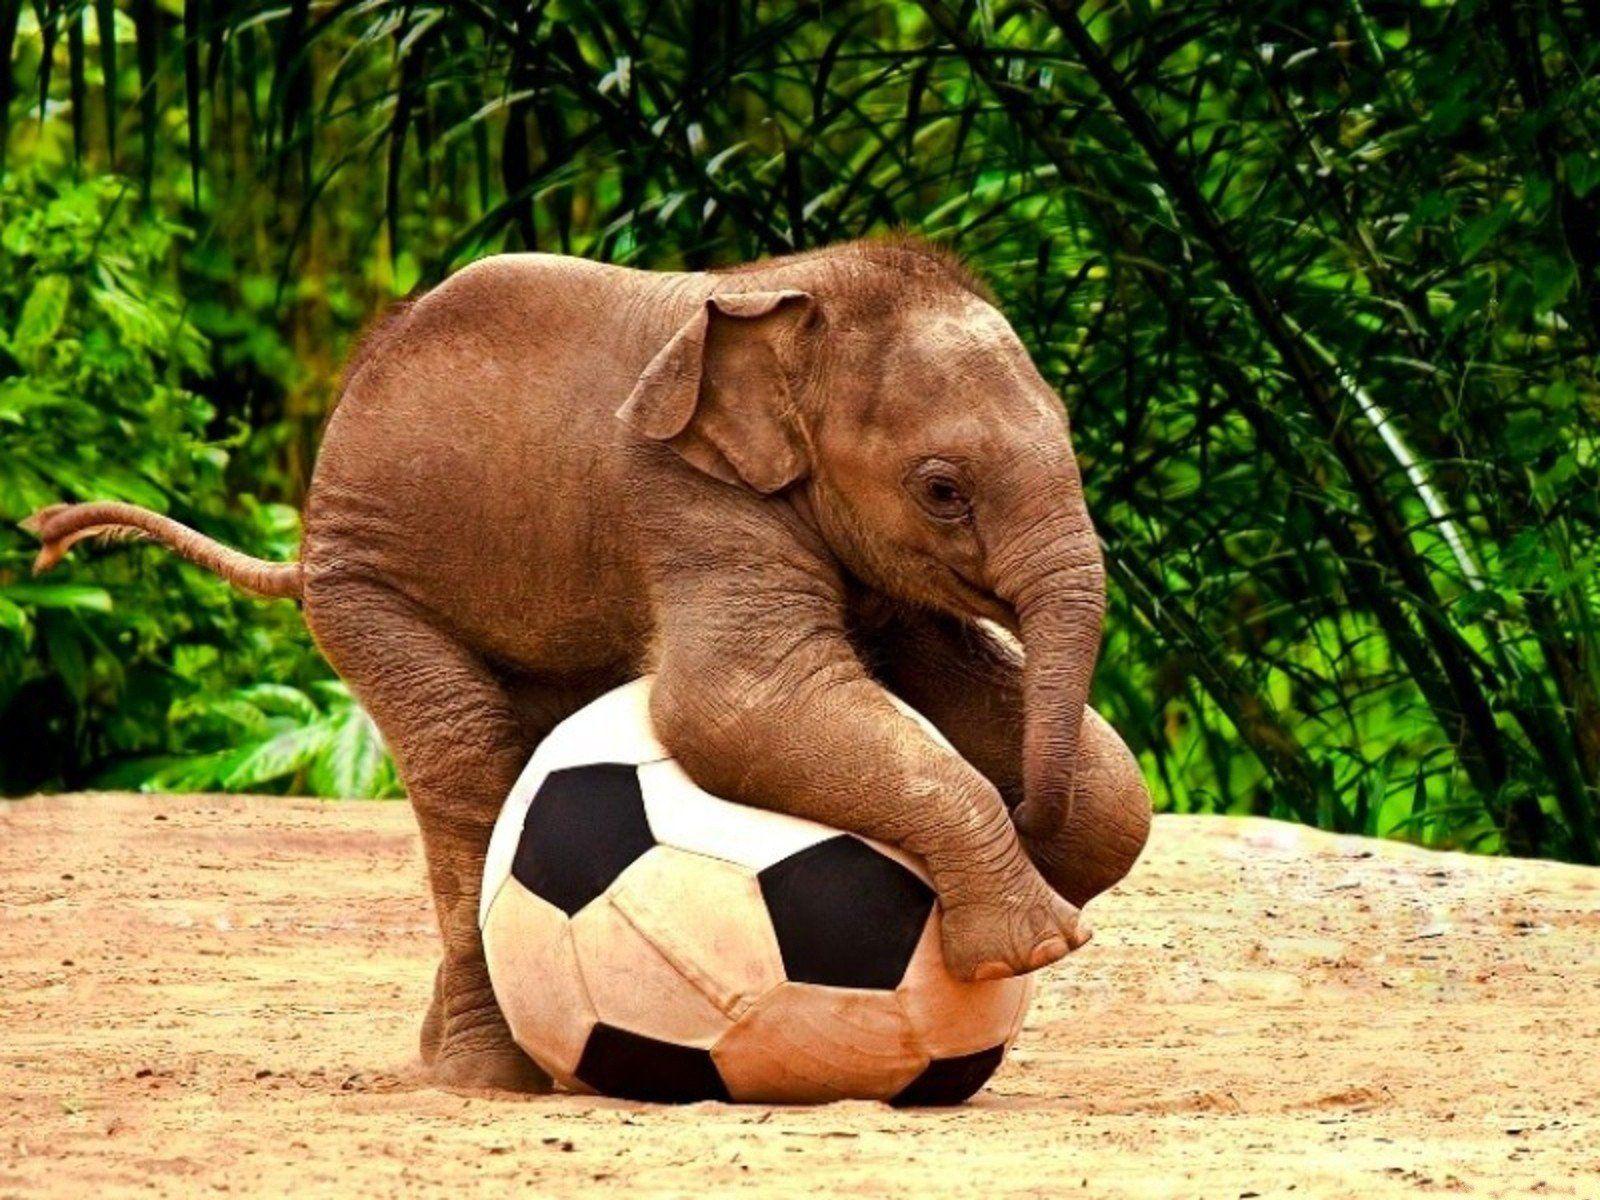 animals wildlife elephants baby elephant christmas globes football